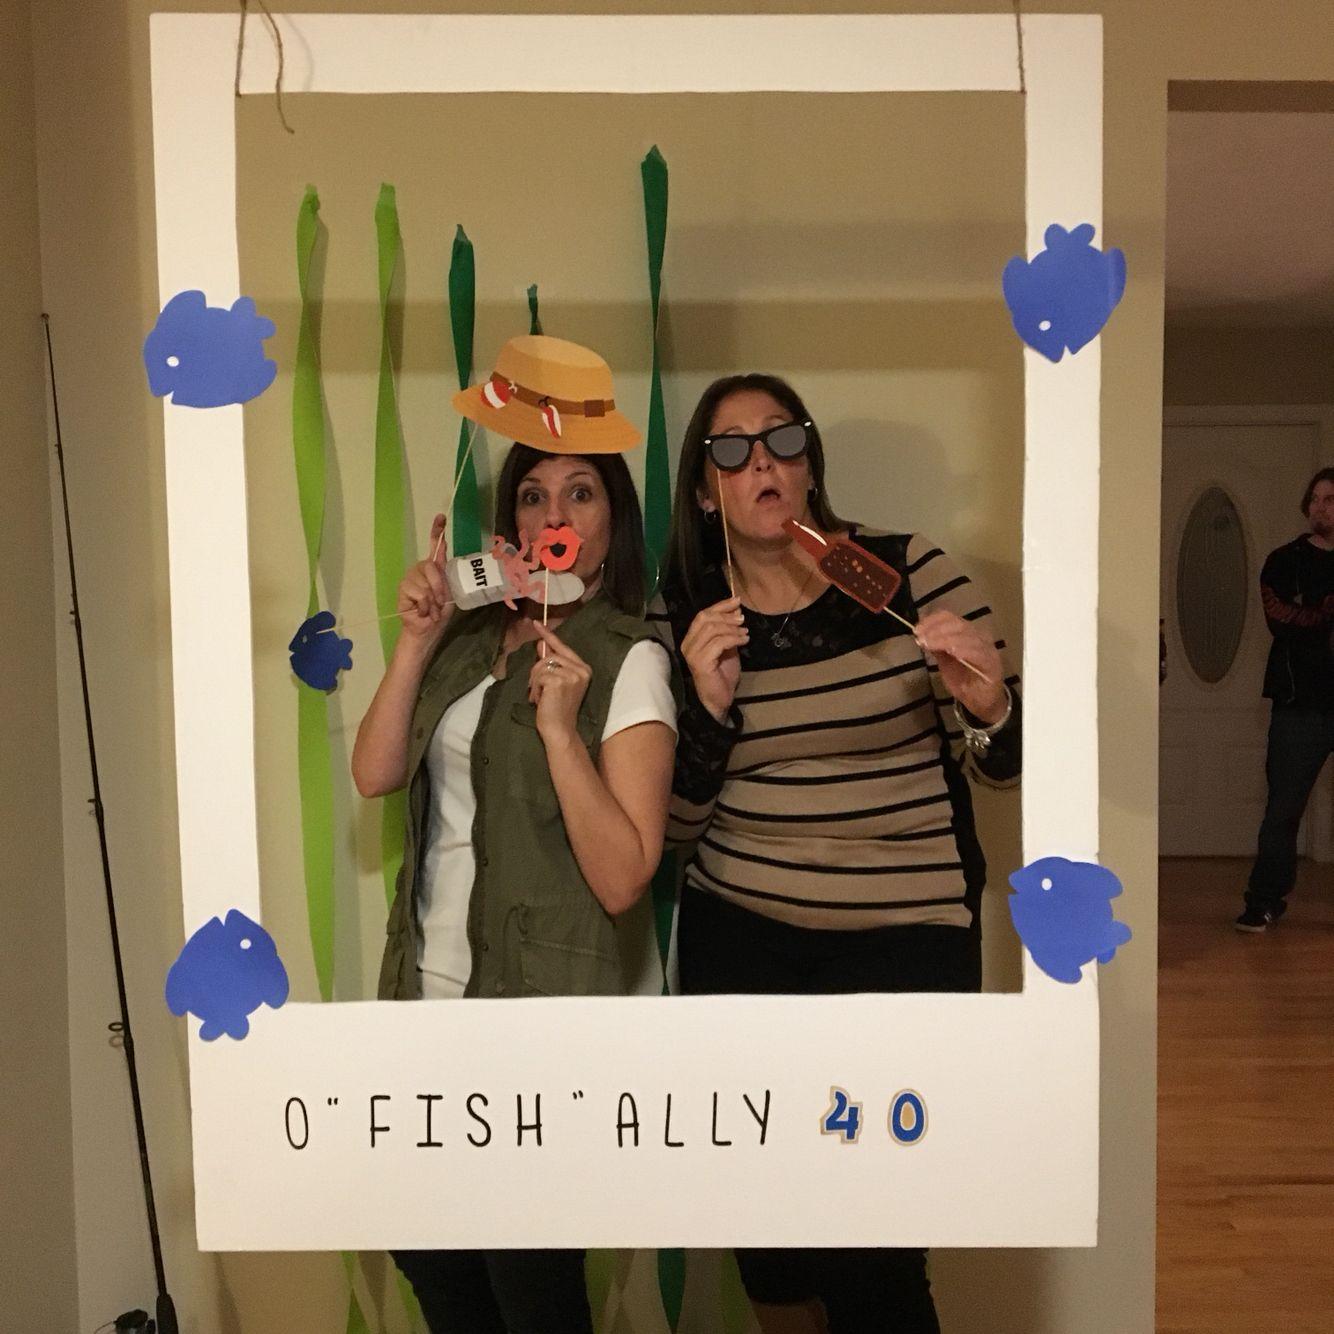 Fishing themed 40th Birthday Photo Booth